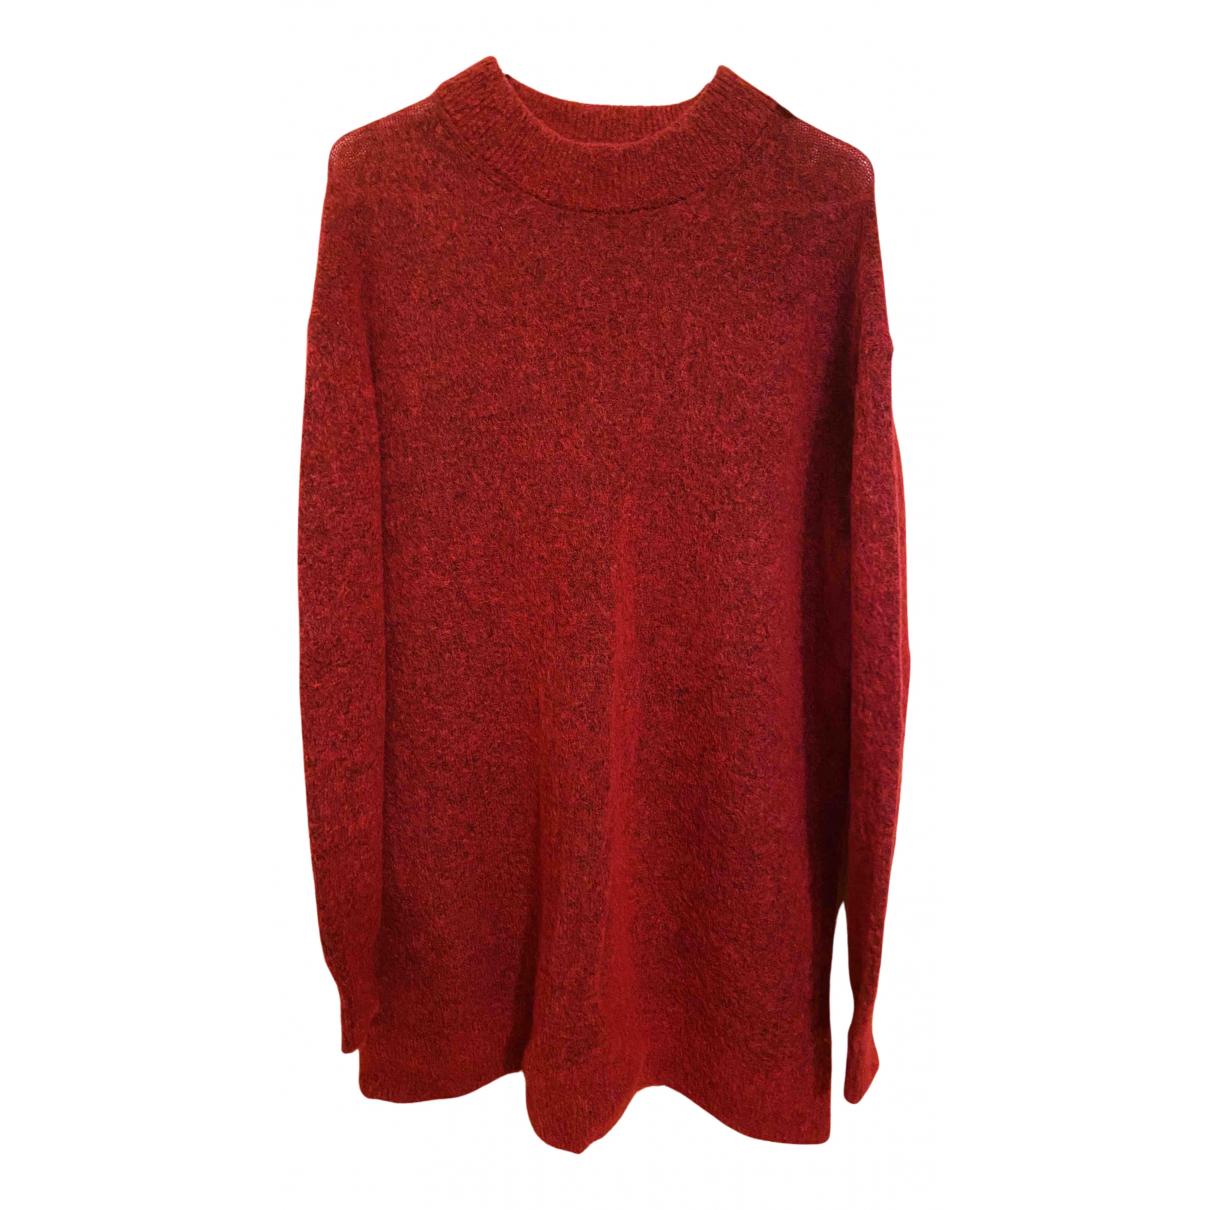 & Other Stories - Pull   pour femme en laine - rouge